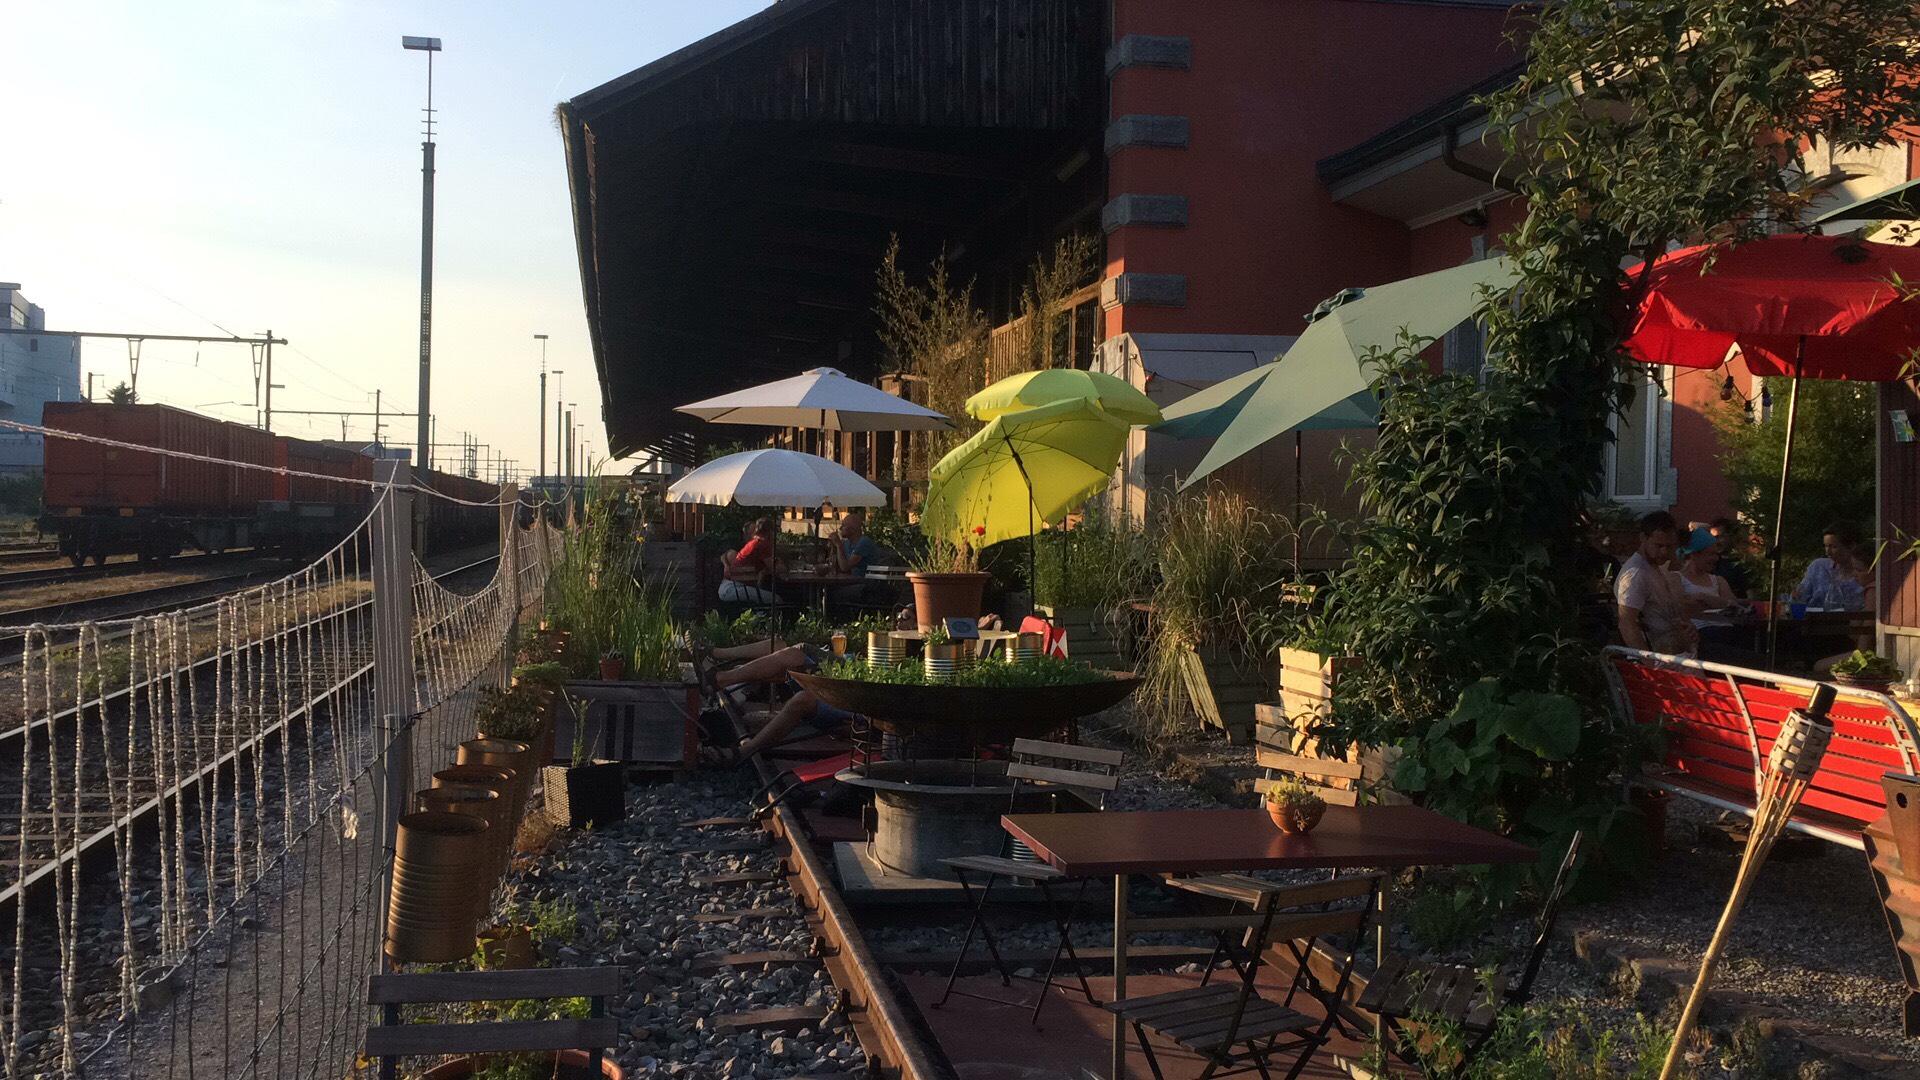 Schoenstes_Kaffee_Basel_Giardino_Urbano.JPG